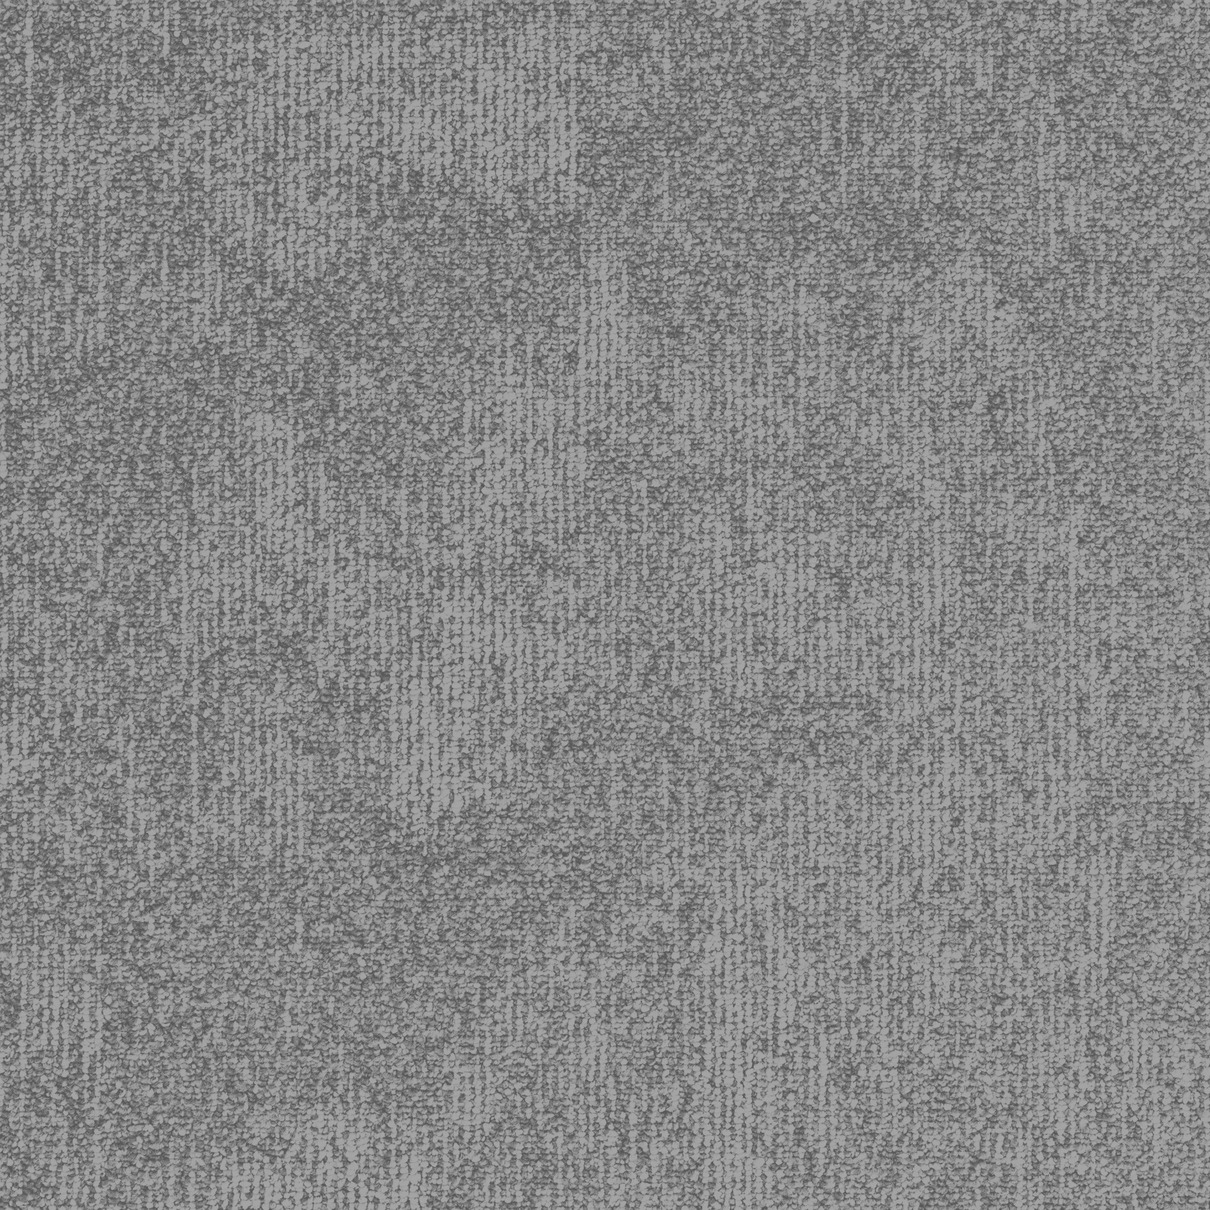 TDES_N915.jpg